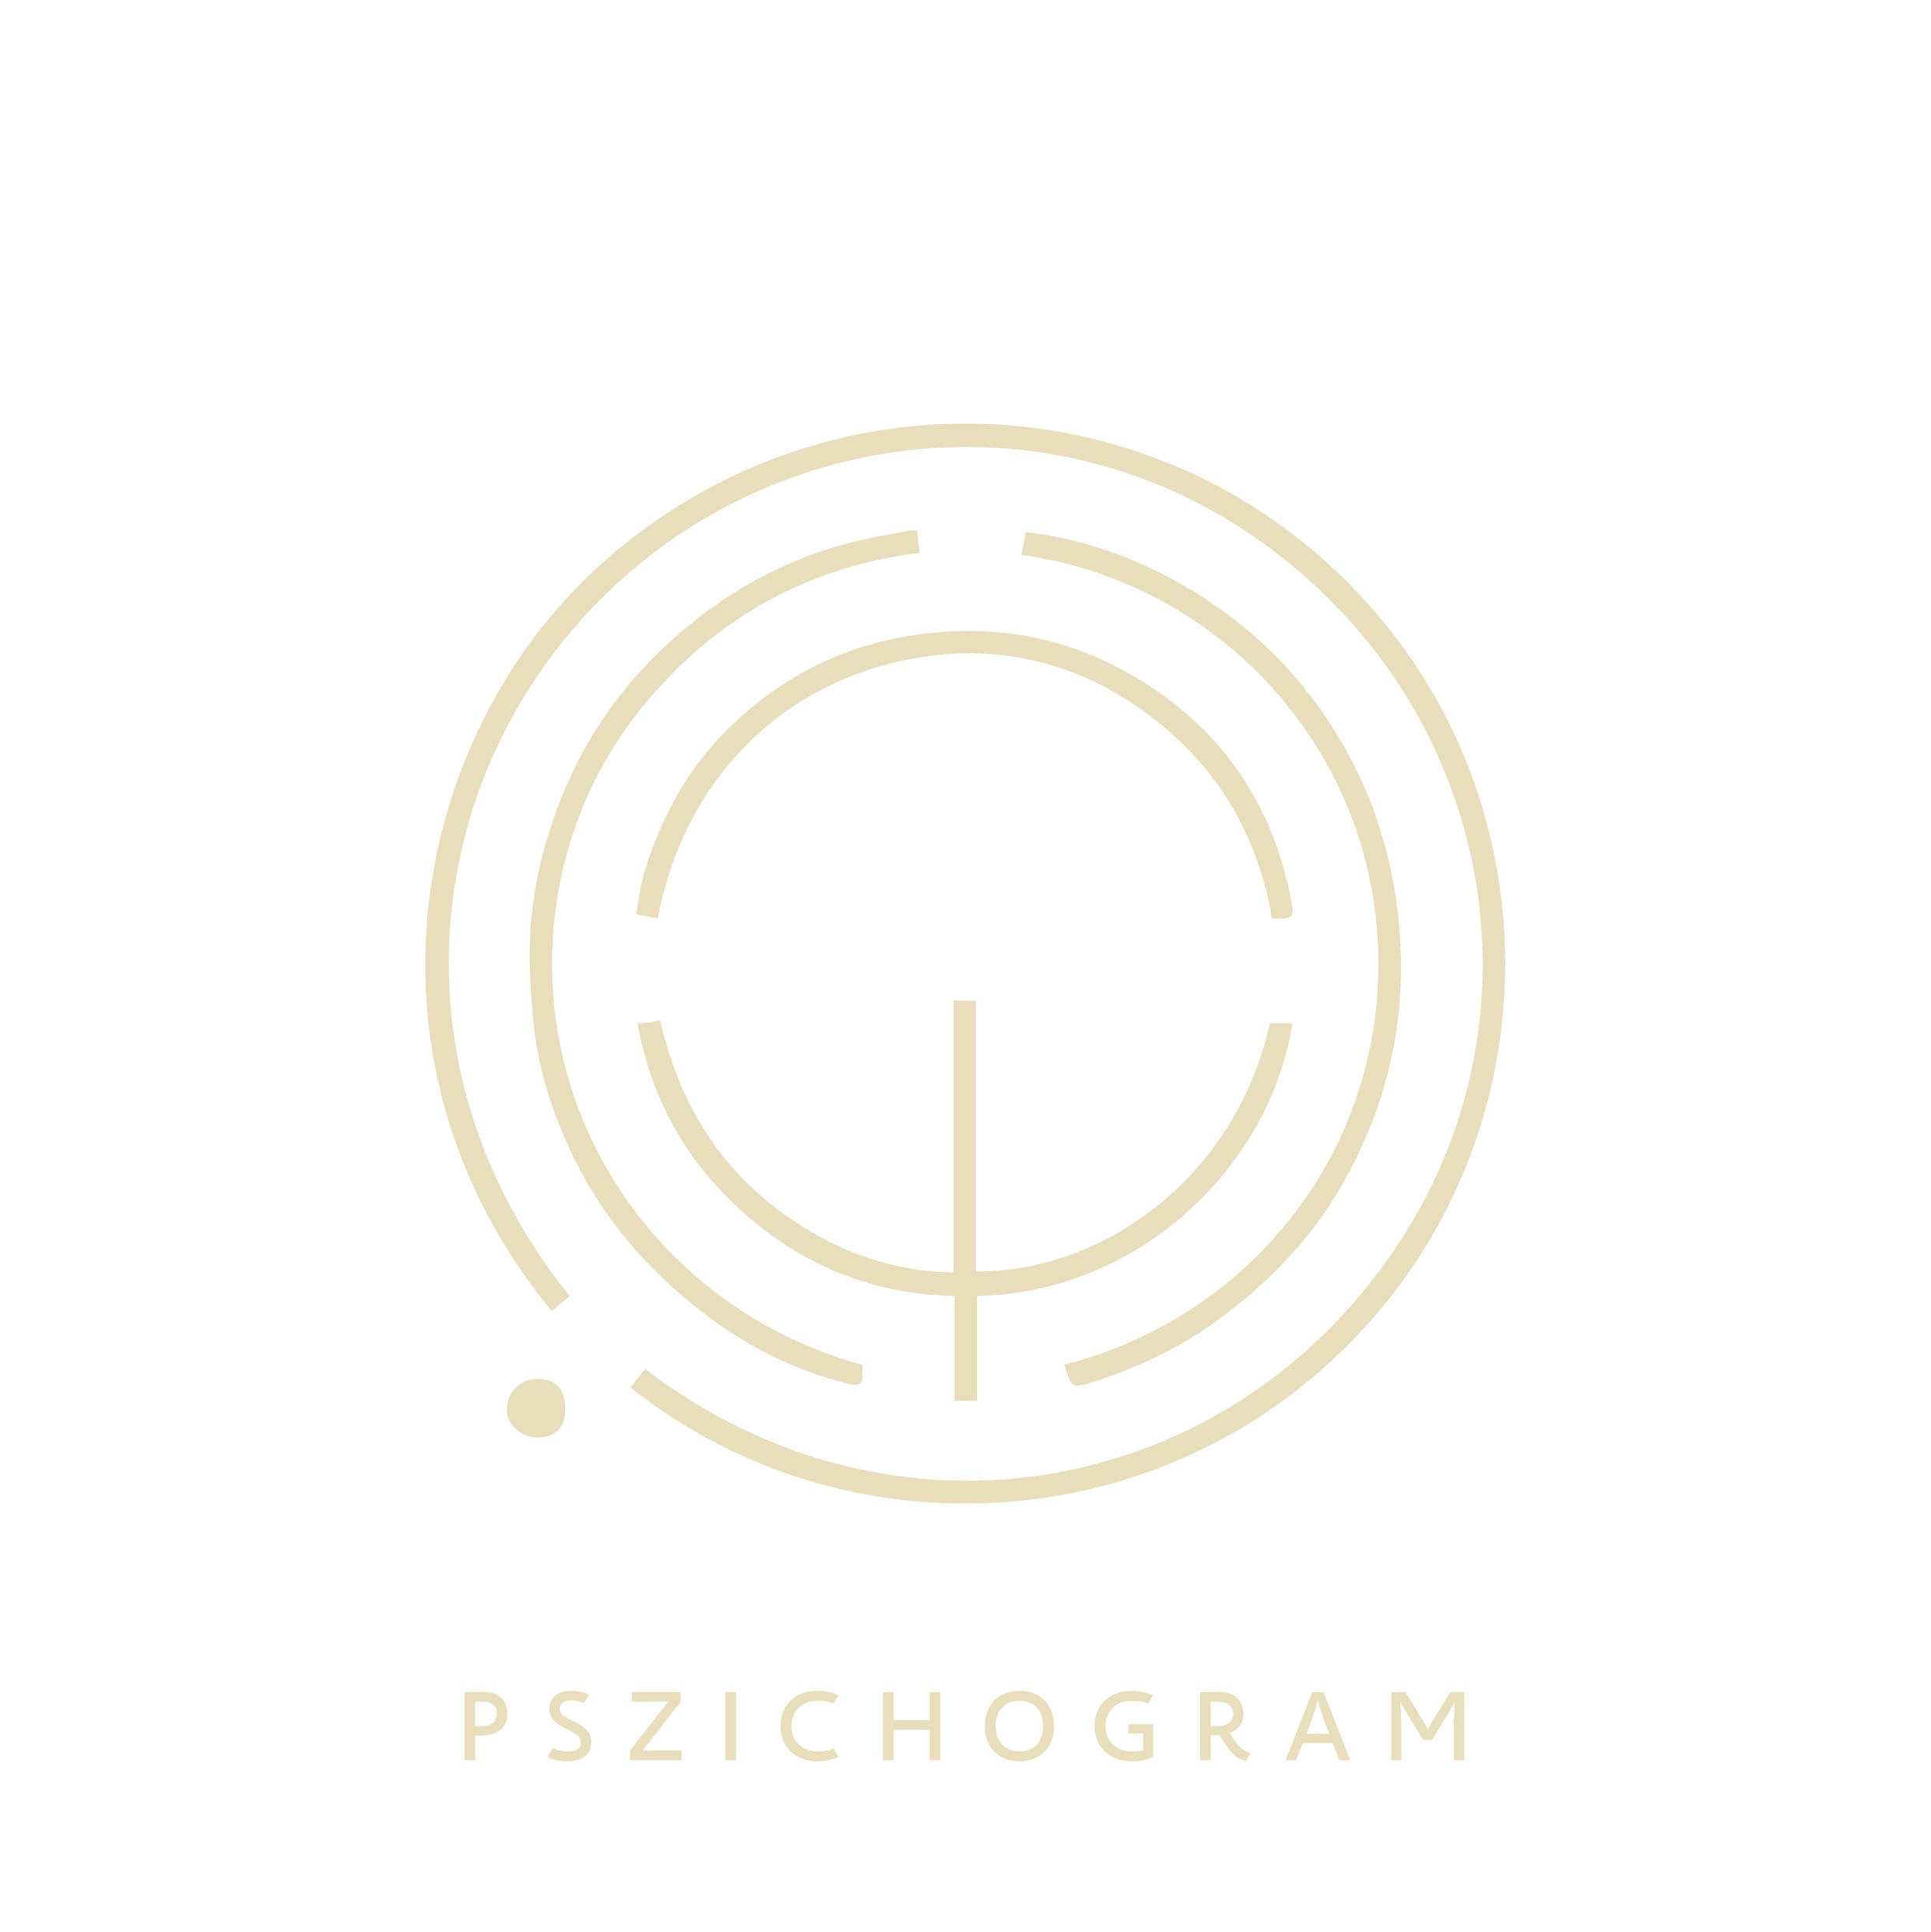 Pszichogram Pszichológiai Tanácsadó logó sárga